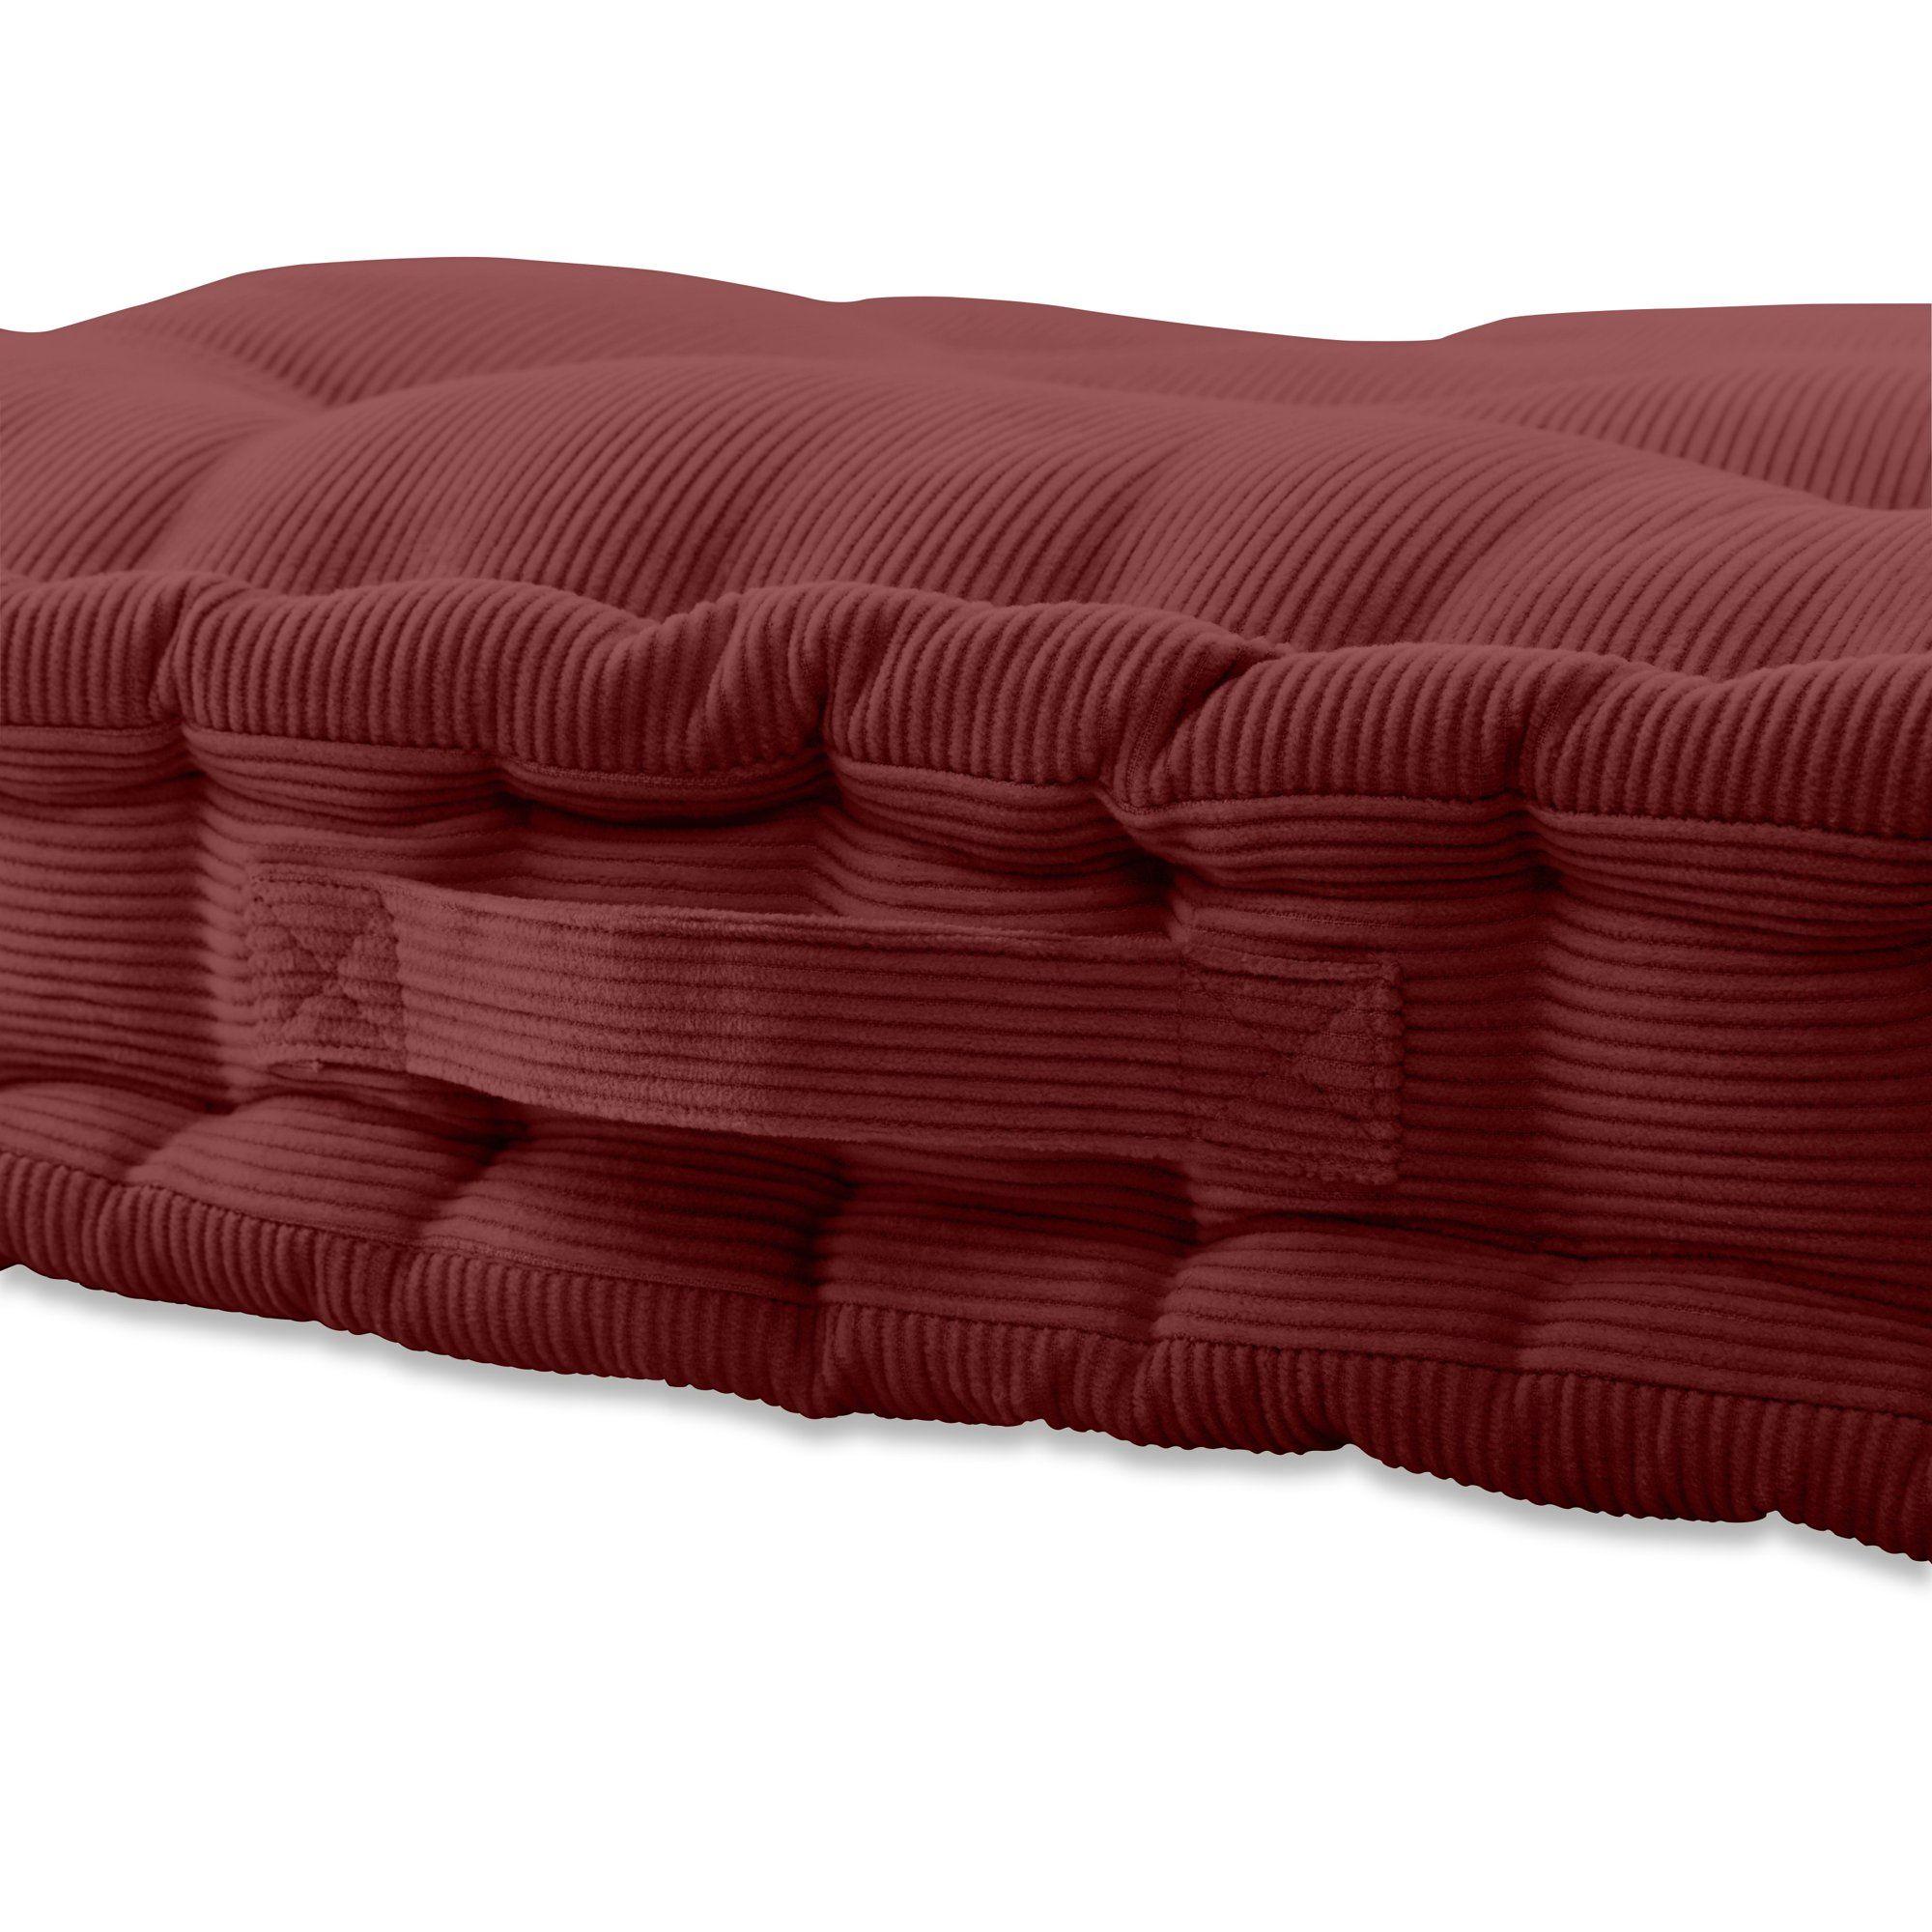 9ca30ce6f04a0b34ba78b30cf2e5abf1 - Better Homes And Gardens Tufted Wicker Settee Cushion